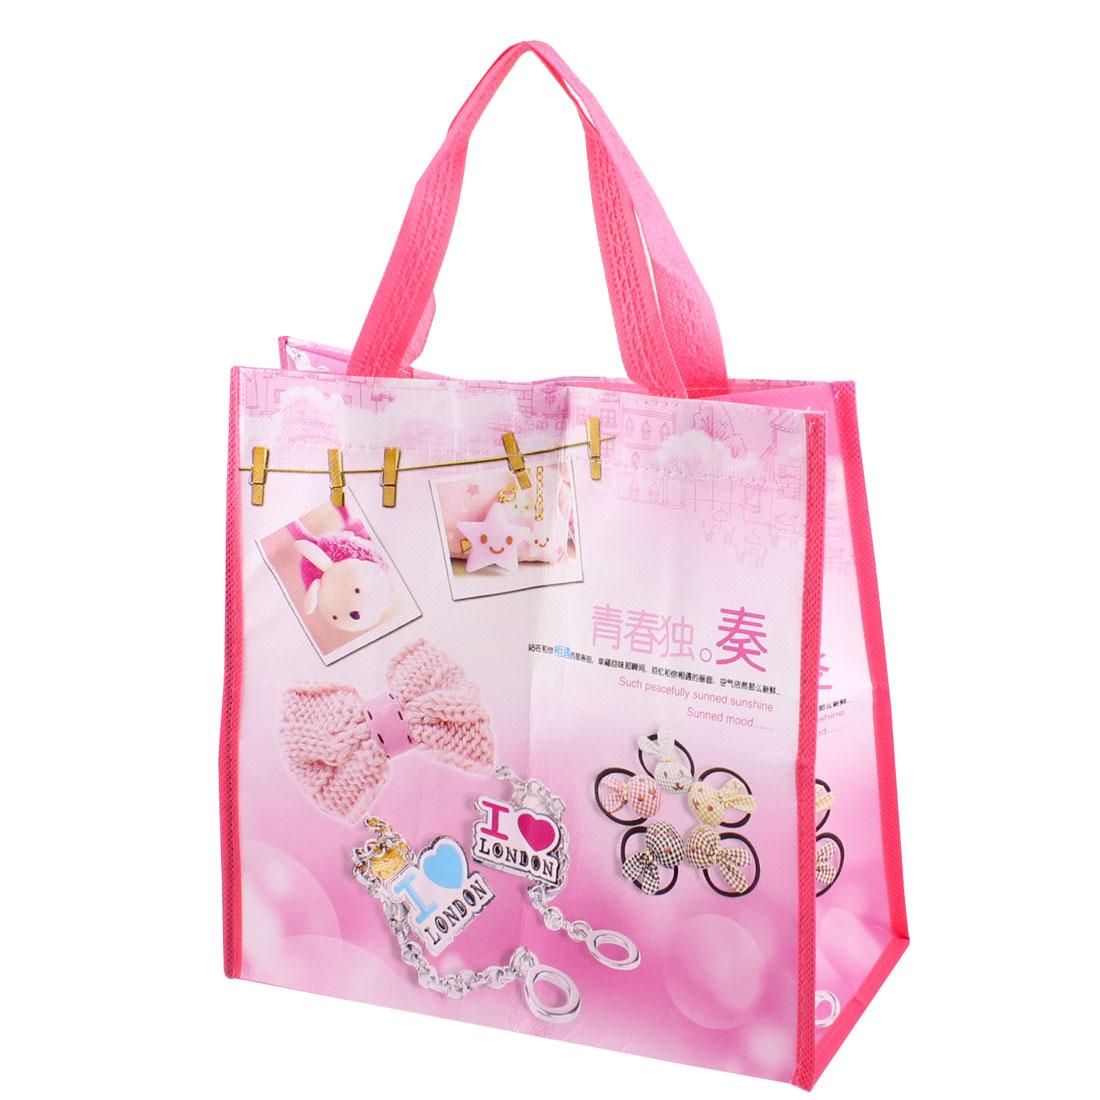 Hook Loop Fastener Foldable Bowtie Pattern Shopping Tote Bag Pink White